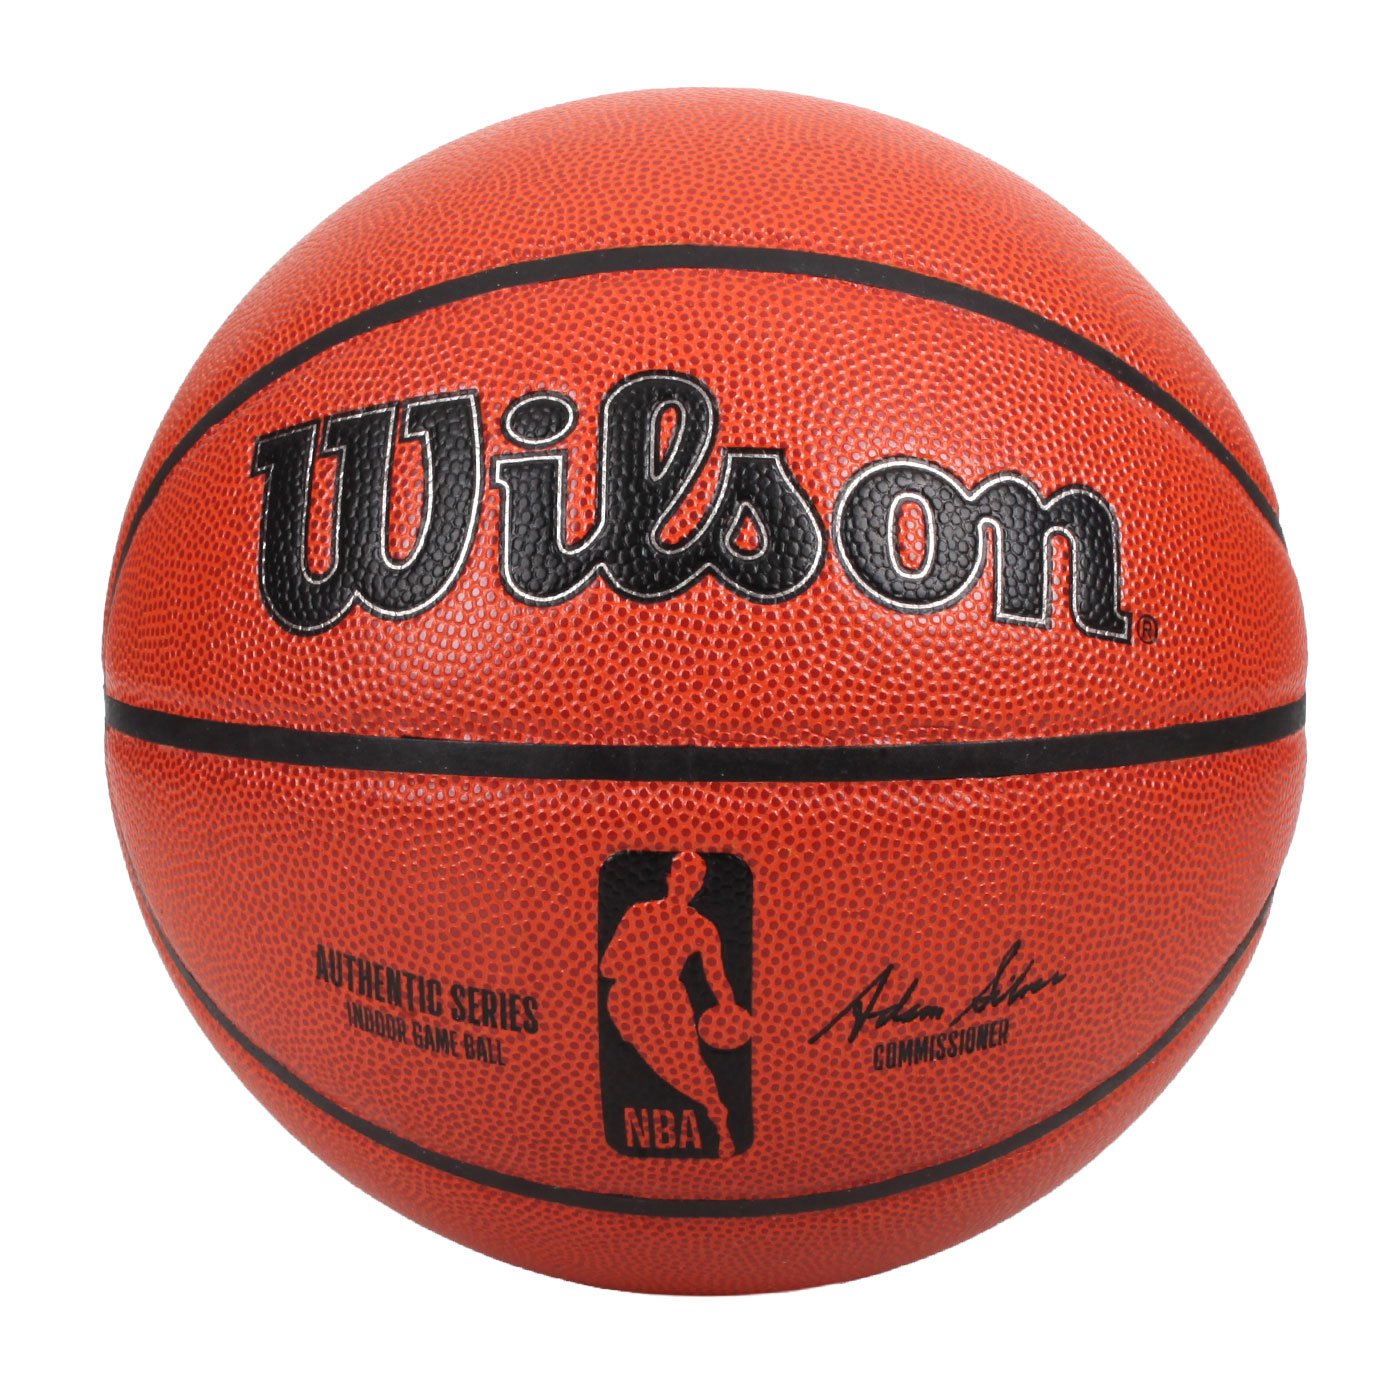 WILSON NBA AUTH系列室內合成皮籃球#7 WTB7100XB07